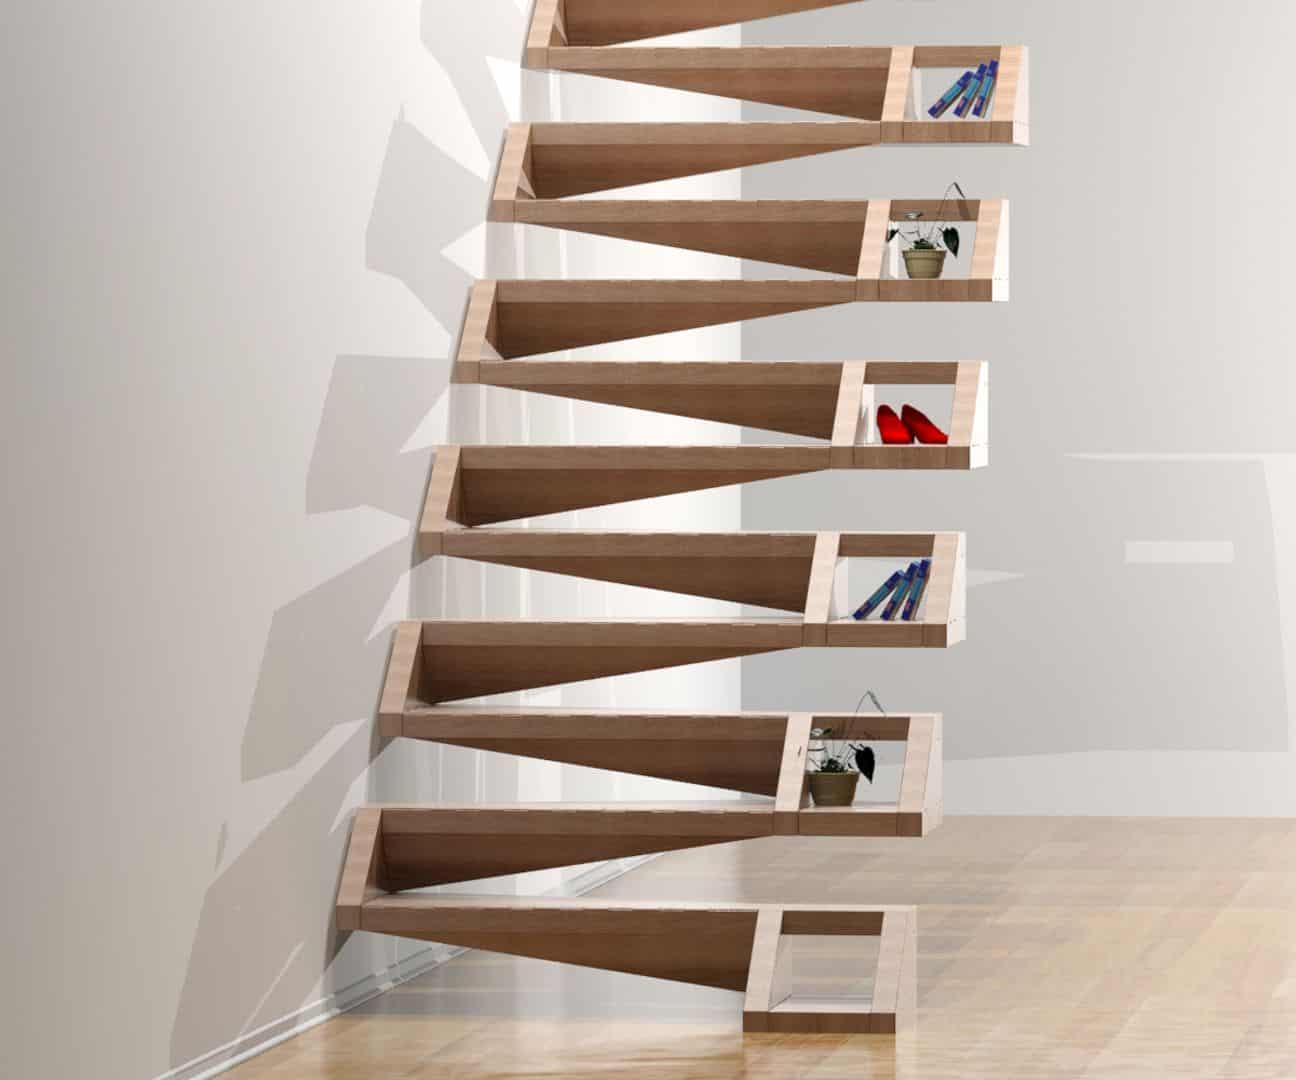 impressive-staircase-design-inspiration-20.jpg